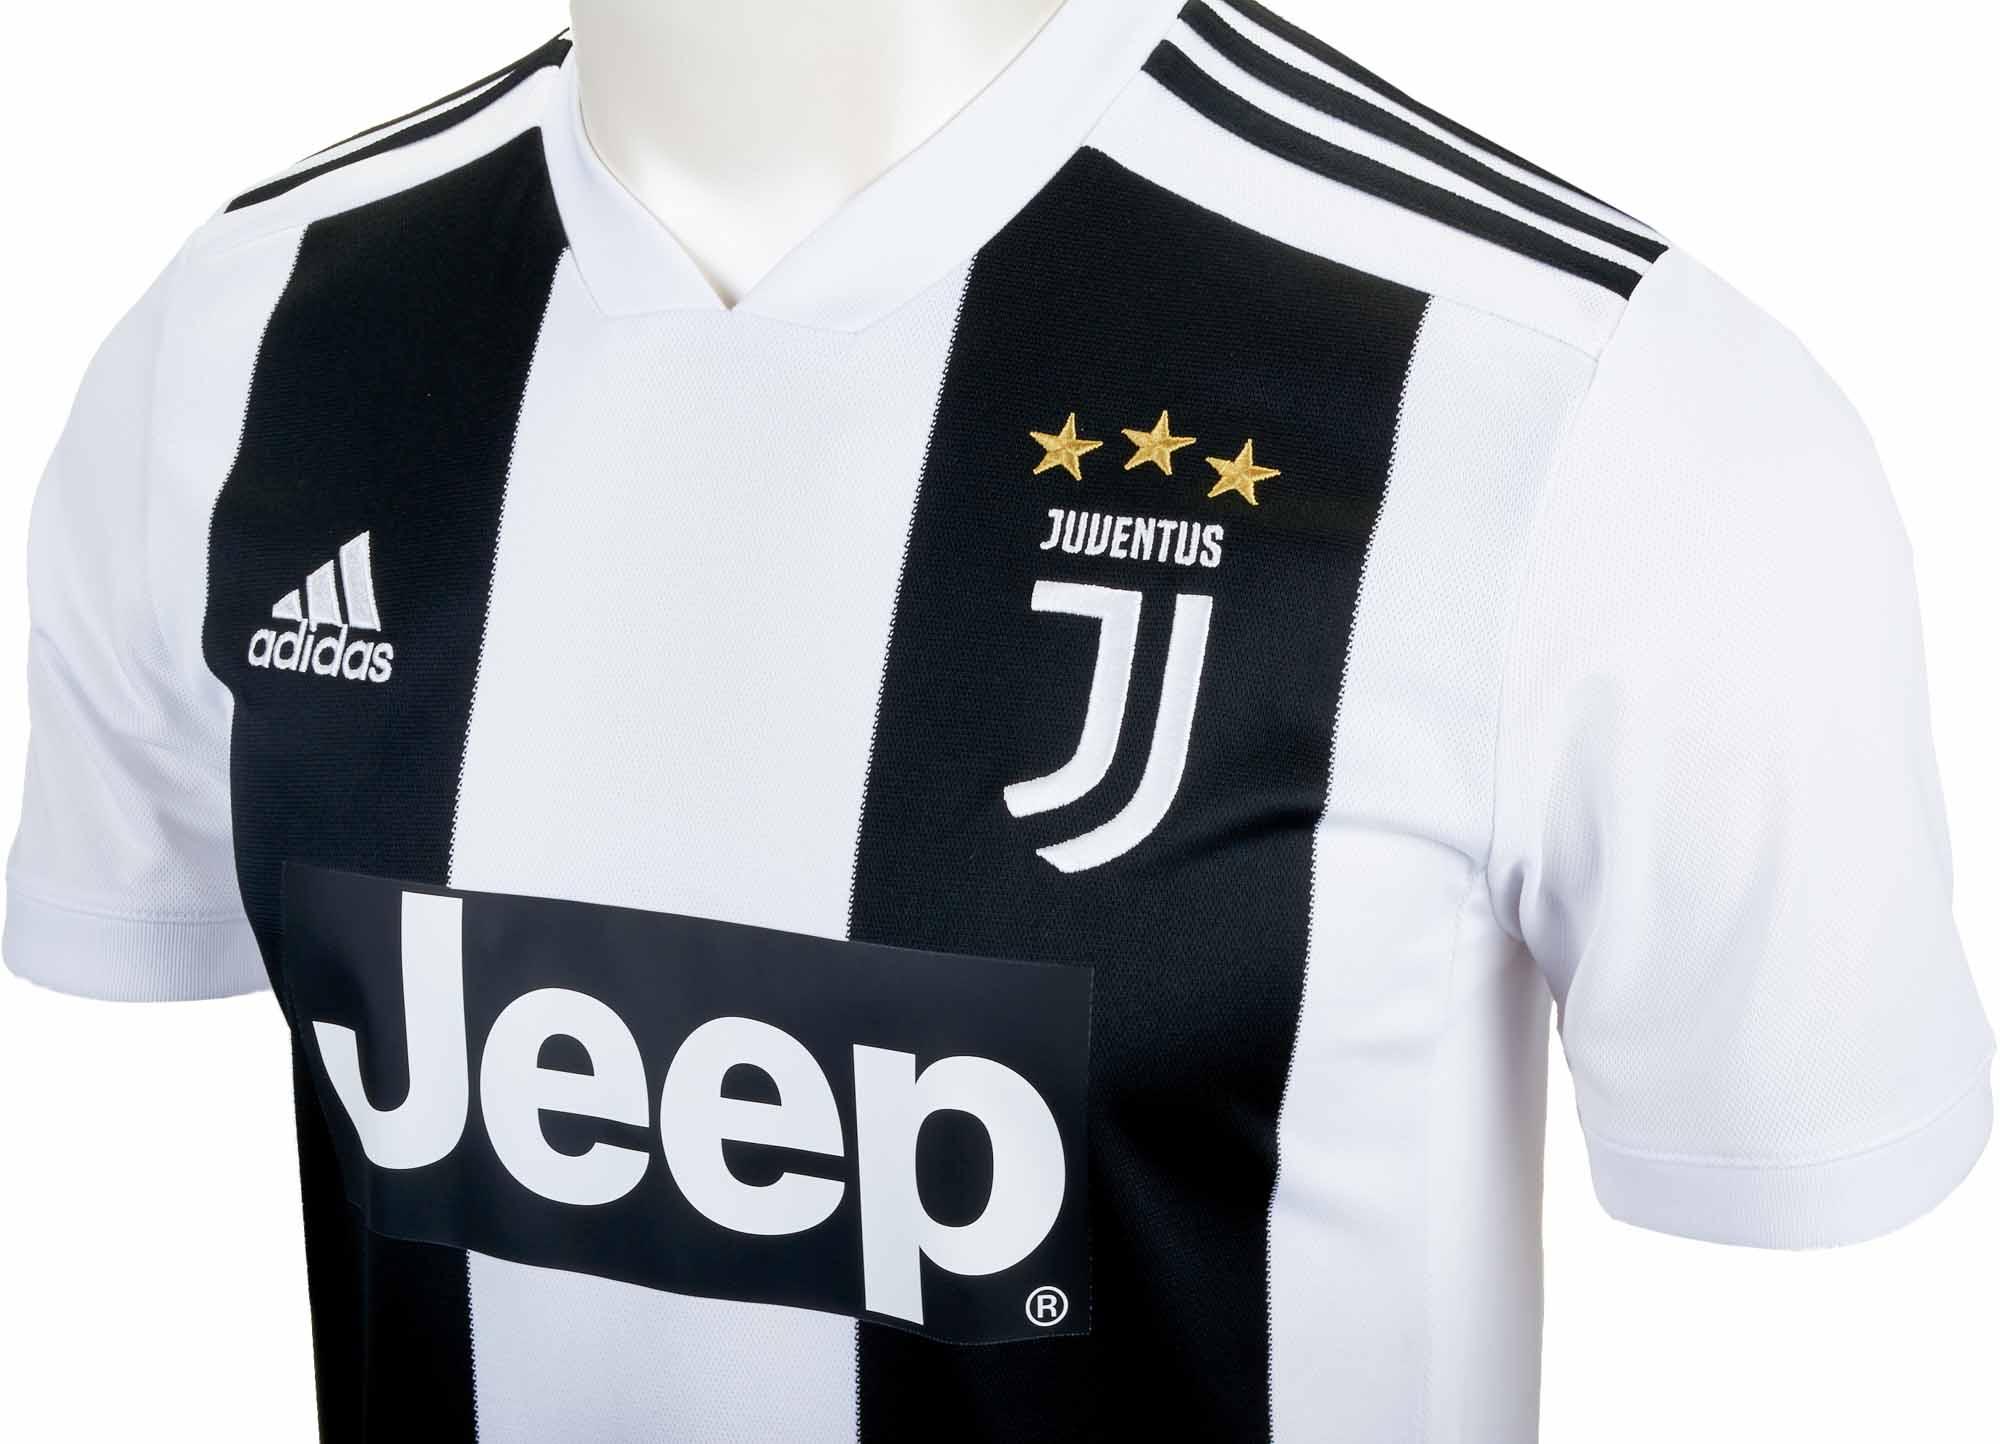 half off 6876f 60864 adidas Cristiano Ronaldo Juventus Home Jersey 2018-19 ...